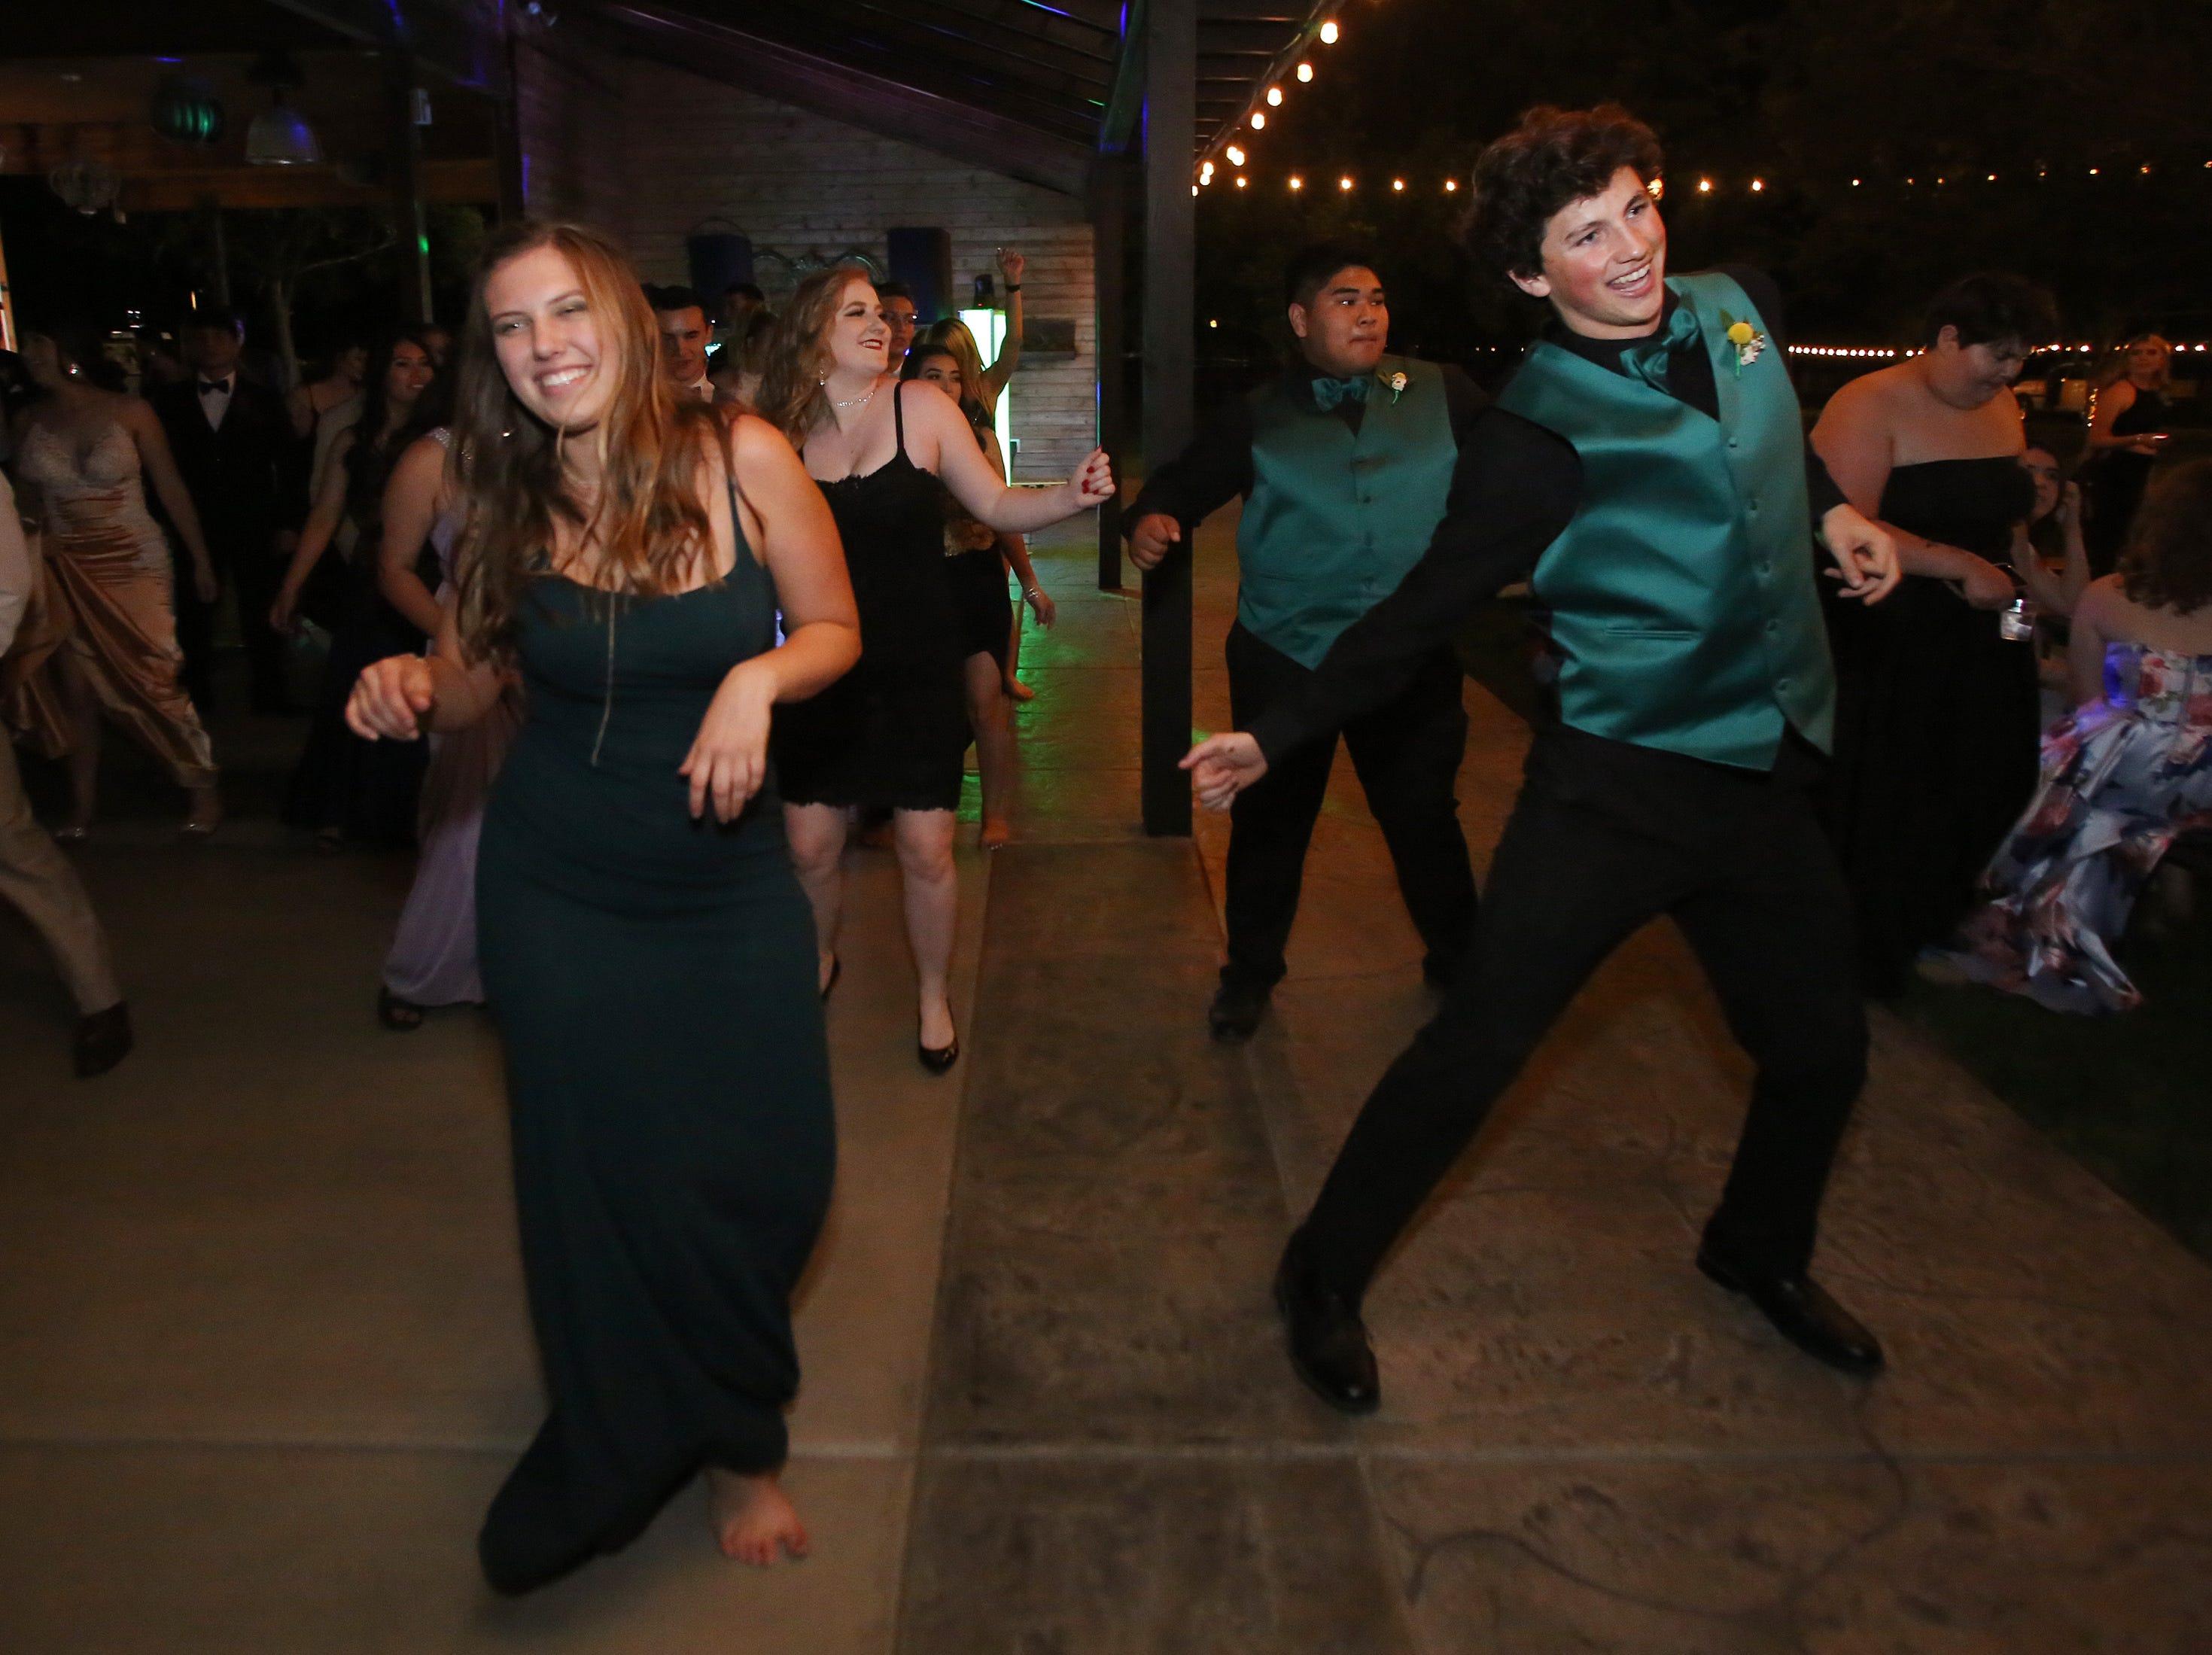 Morgan Weldon, left and Caleb Peltzer enjoys the dance festivities as Morgan Dougherty and Nicholas Tangonan behind dance along at the Exeter Union High School prom Saturday, May 4, 2019 in Woodlake, Calif.